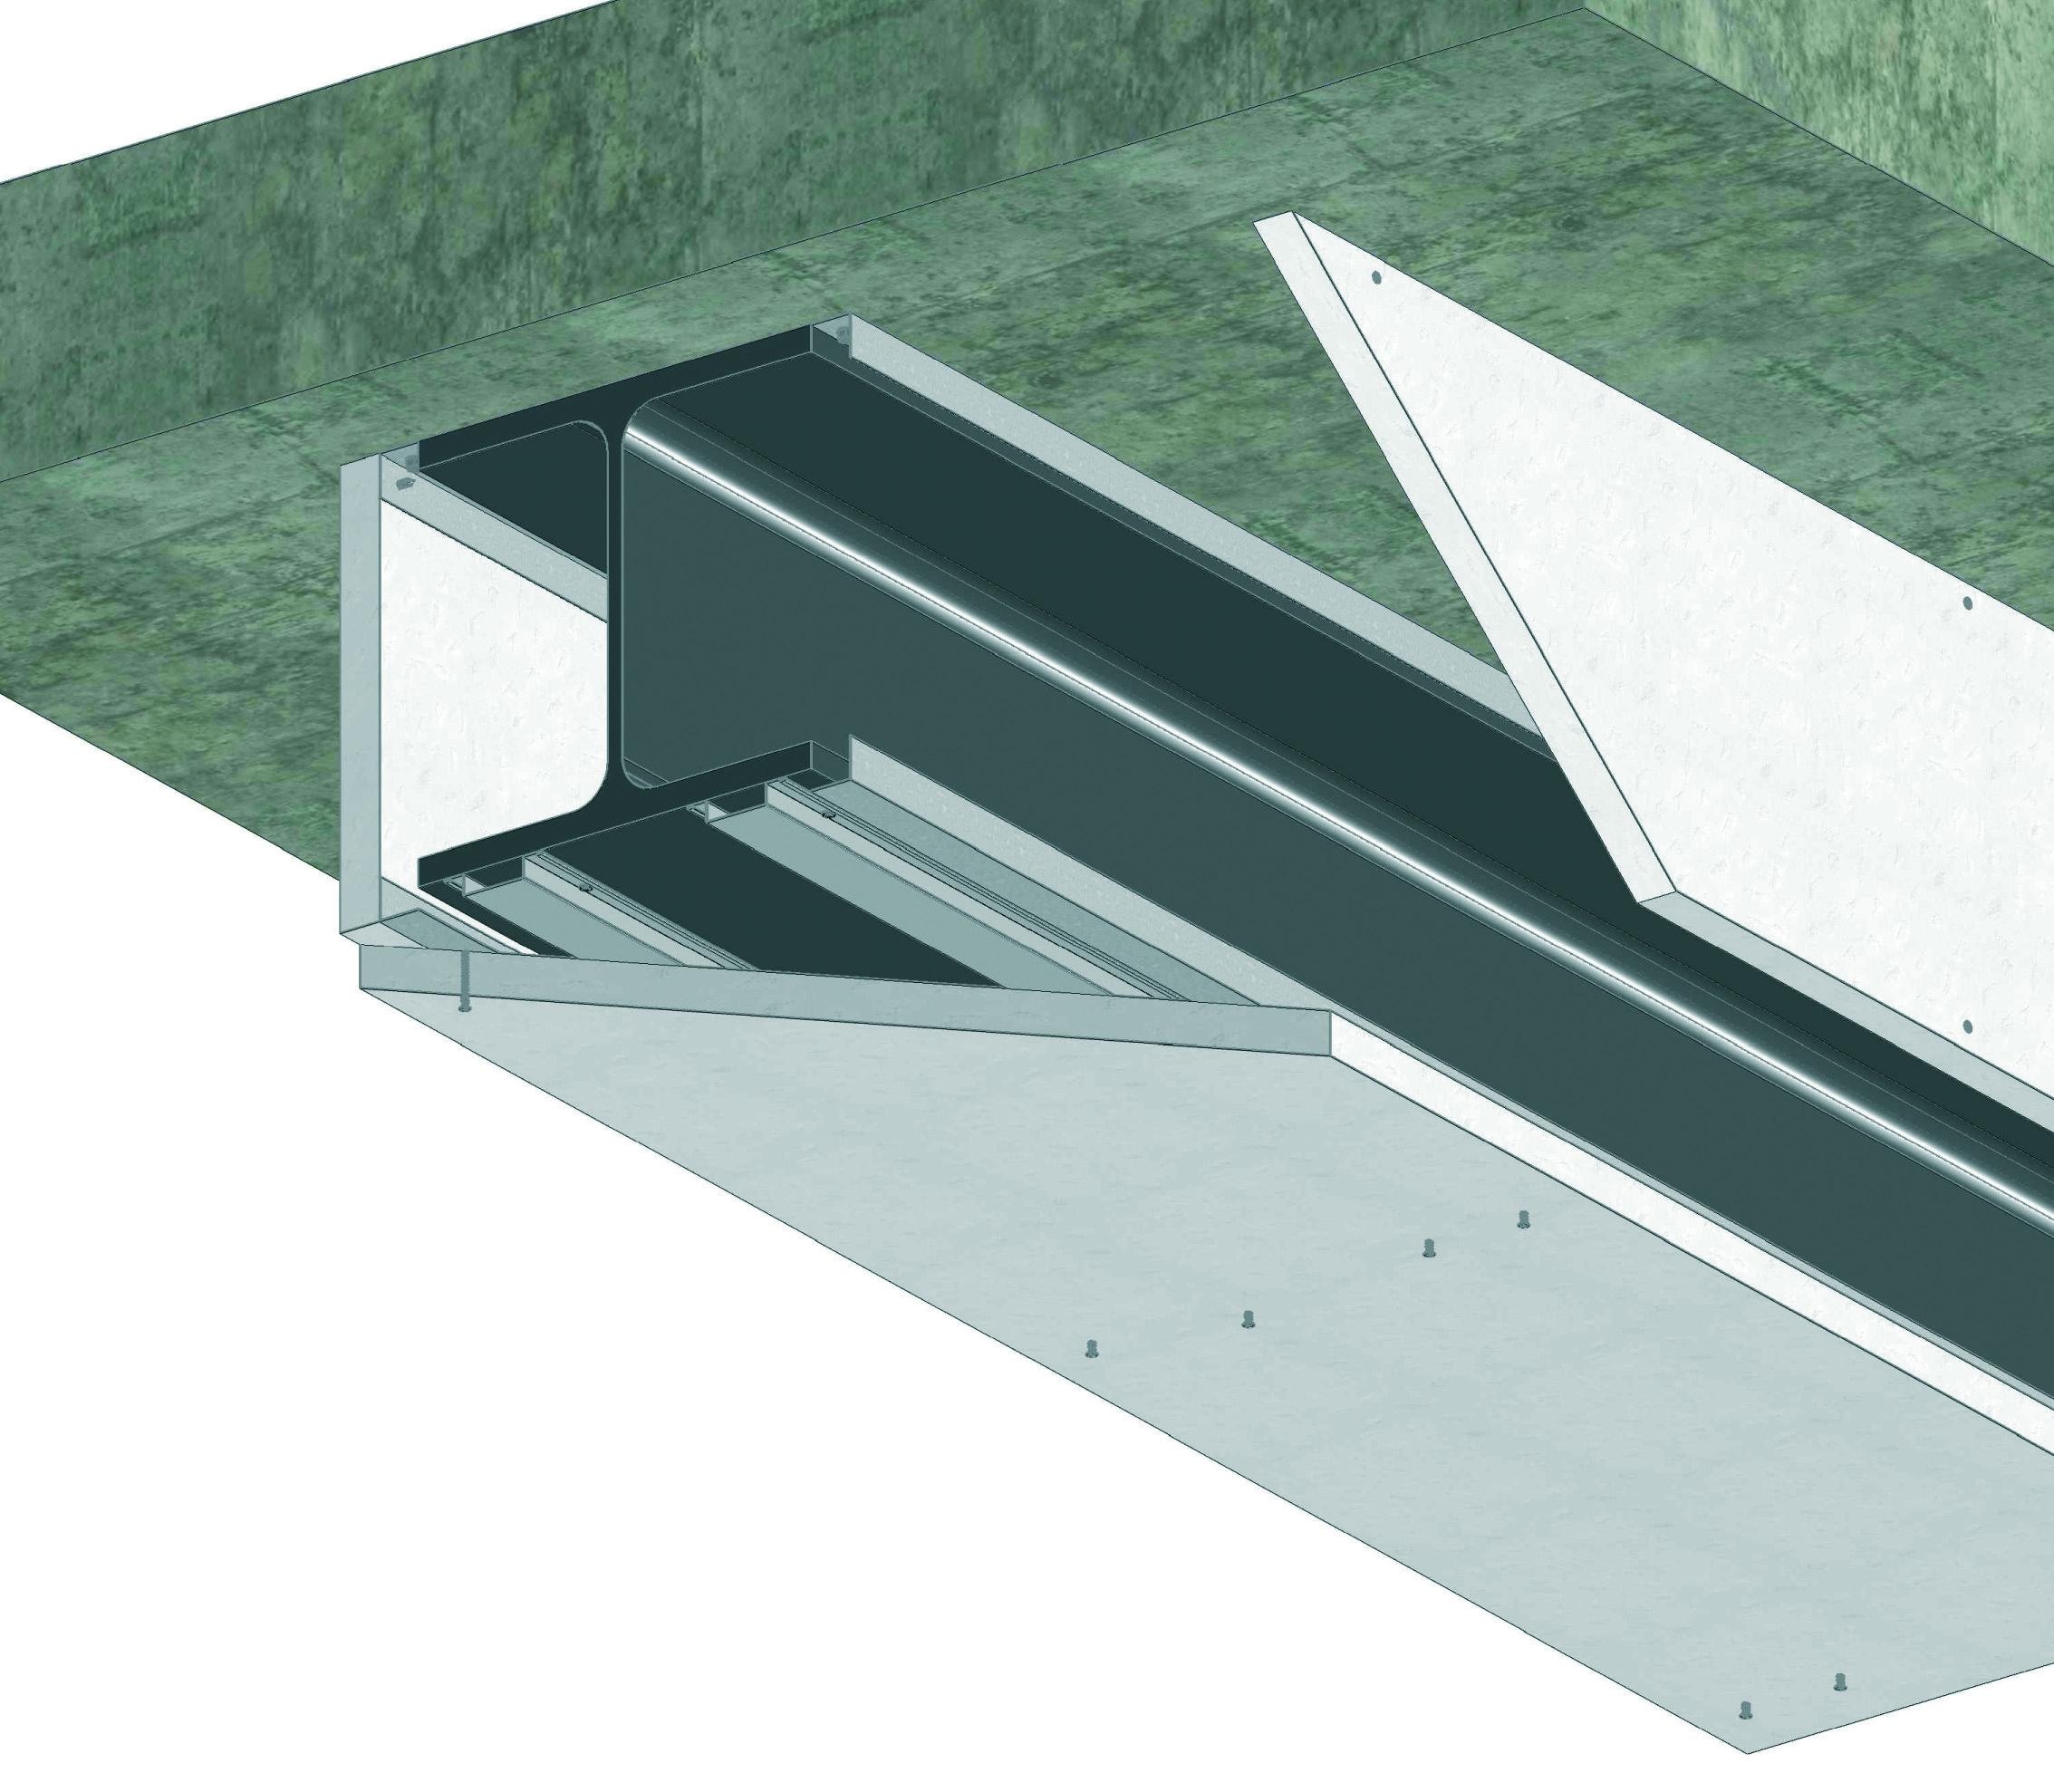 proteccion-estructura-metalica